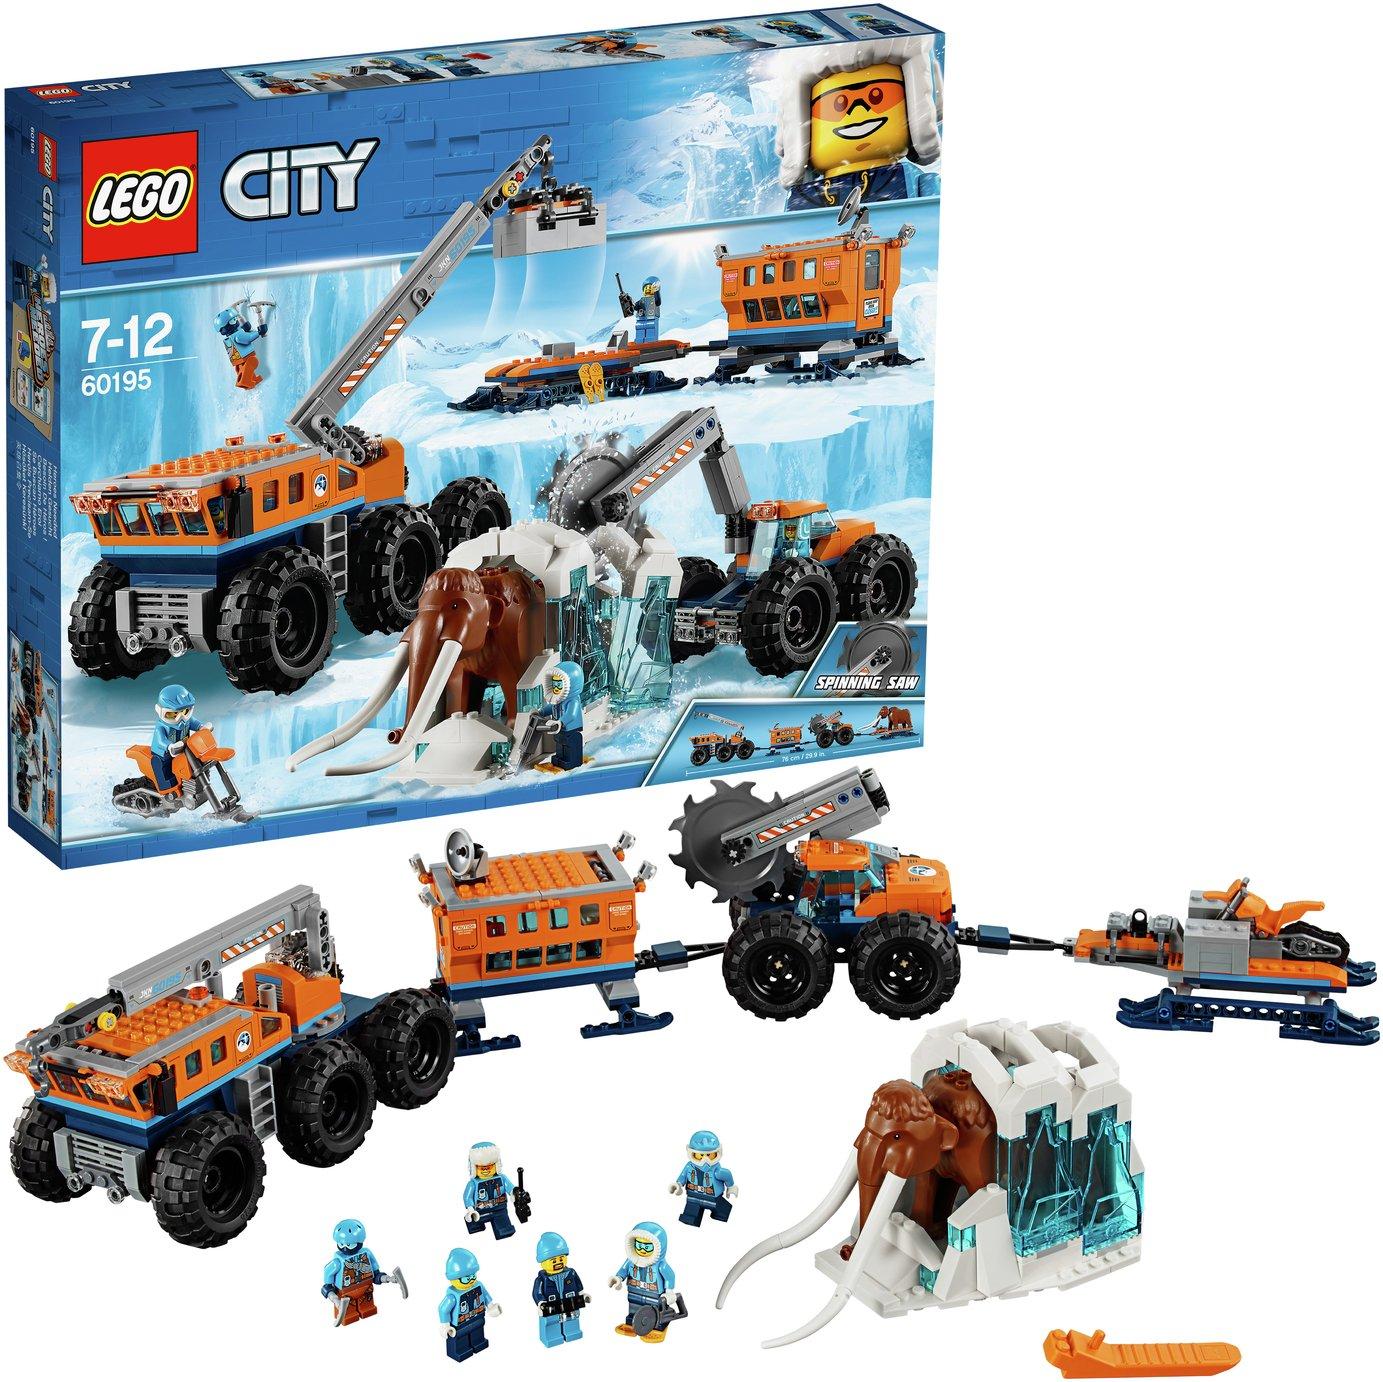 LEGO City Arctic Mobile Exploration Base Toy - 60195